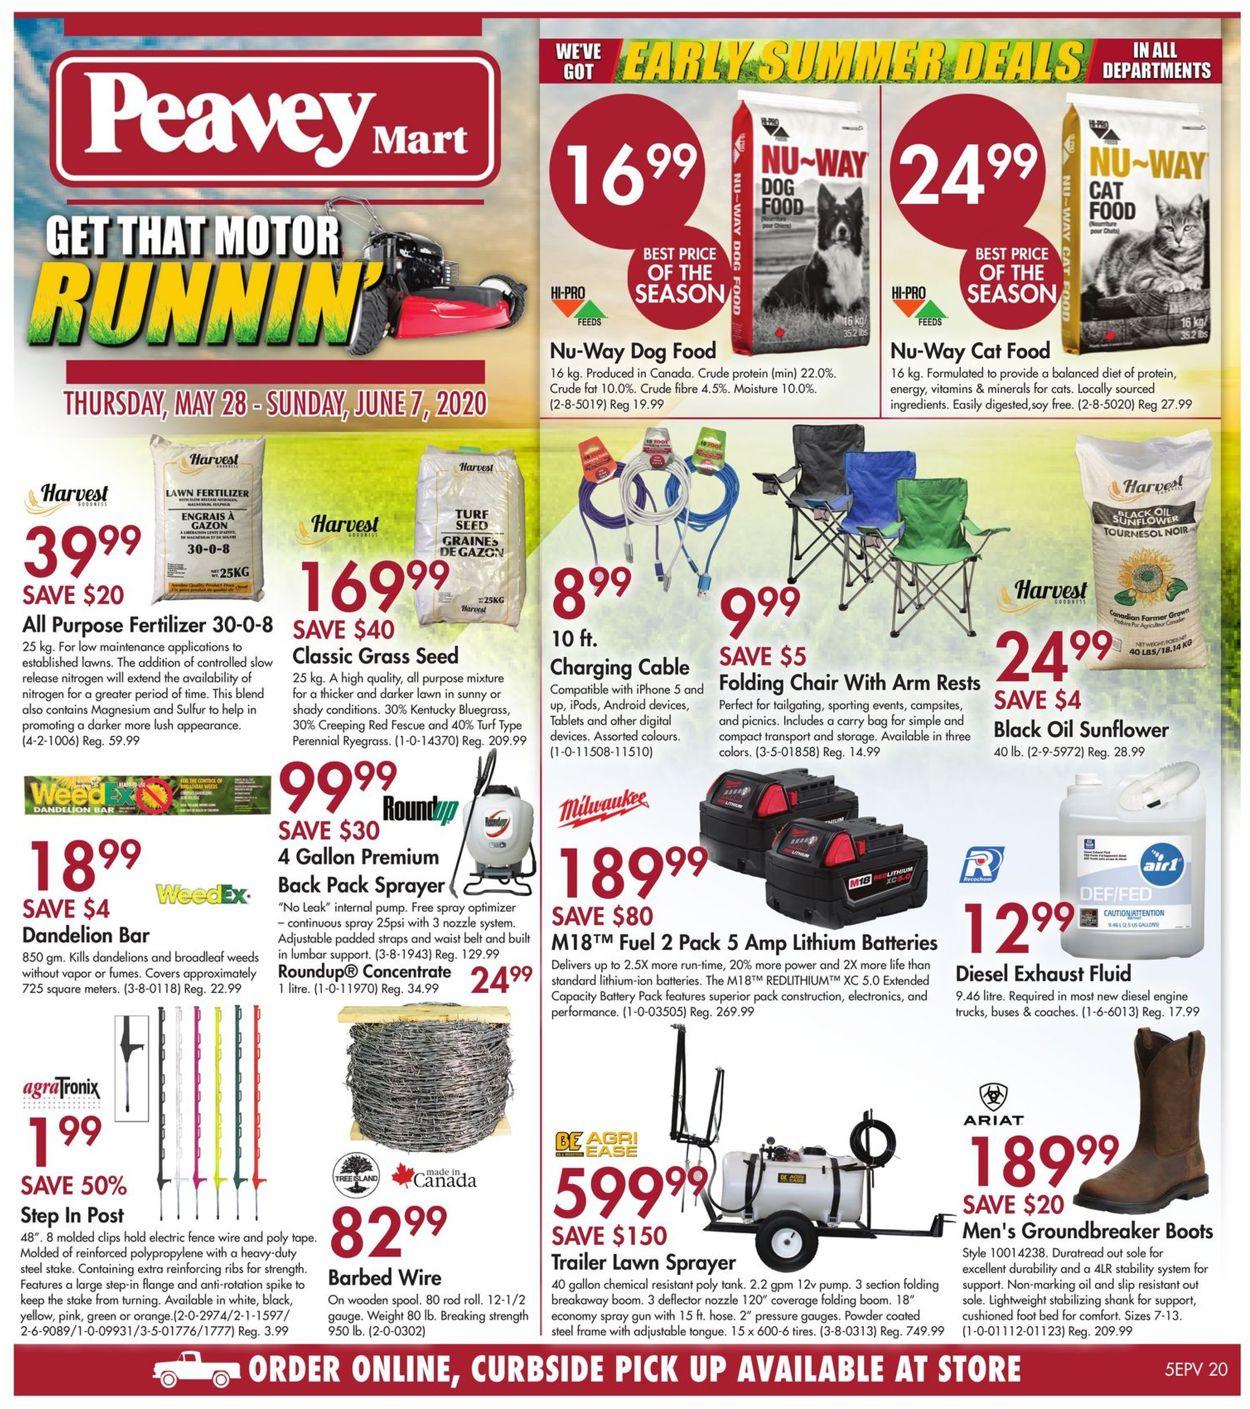 Peavey Mart Flyer - 05/28-06/07/2020